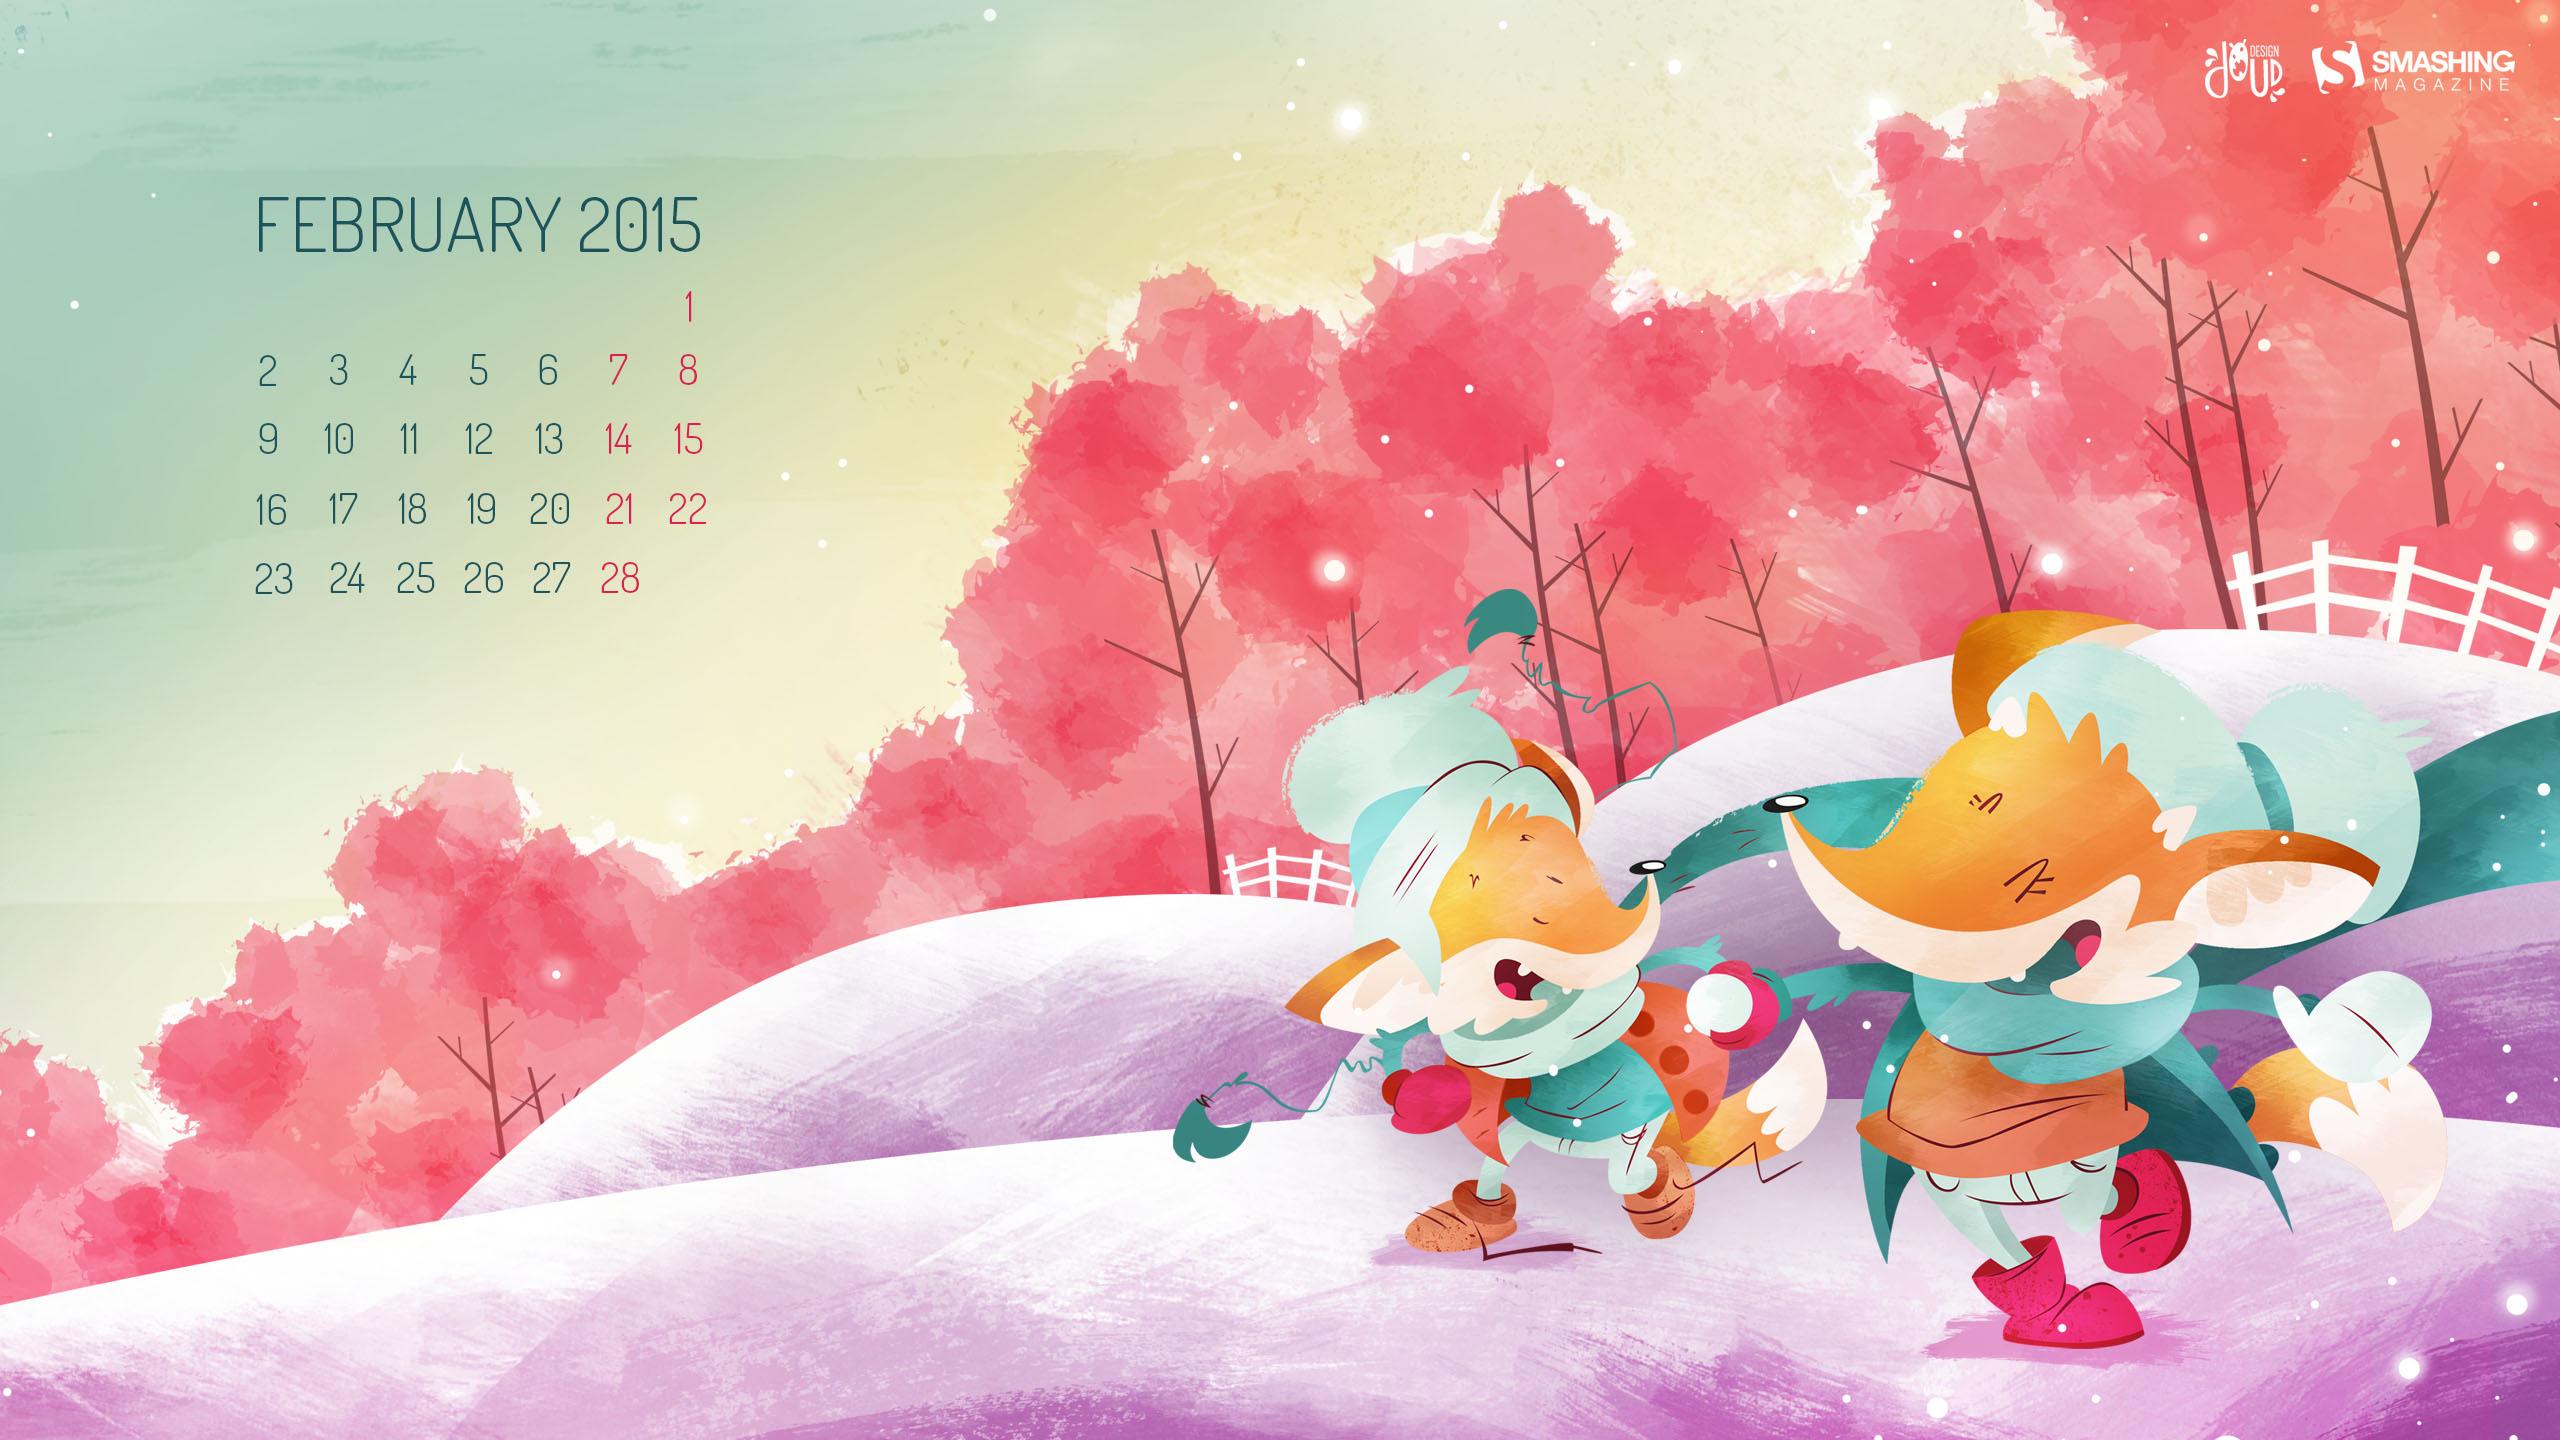 Desktop Wallpaper Calendars February 2015 Smashing Magazine 2560x1440